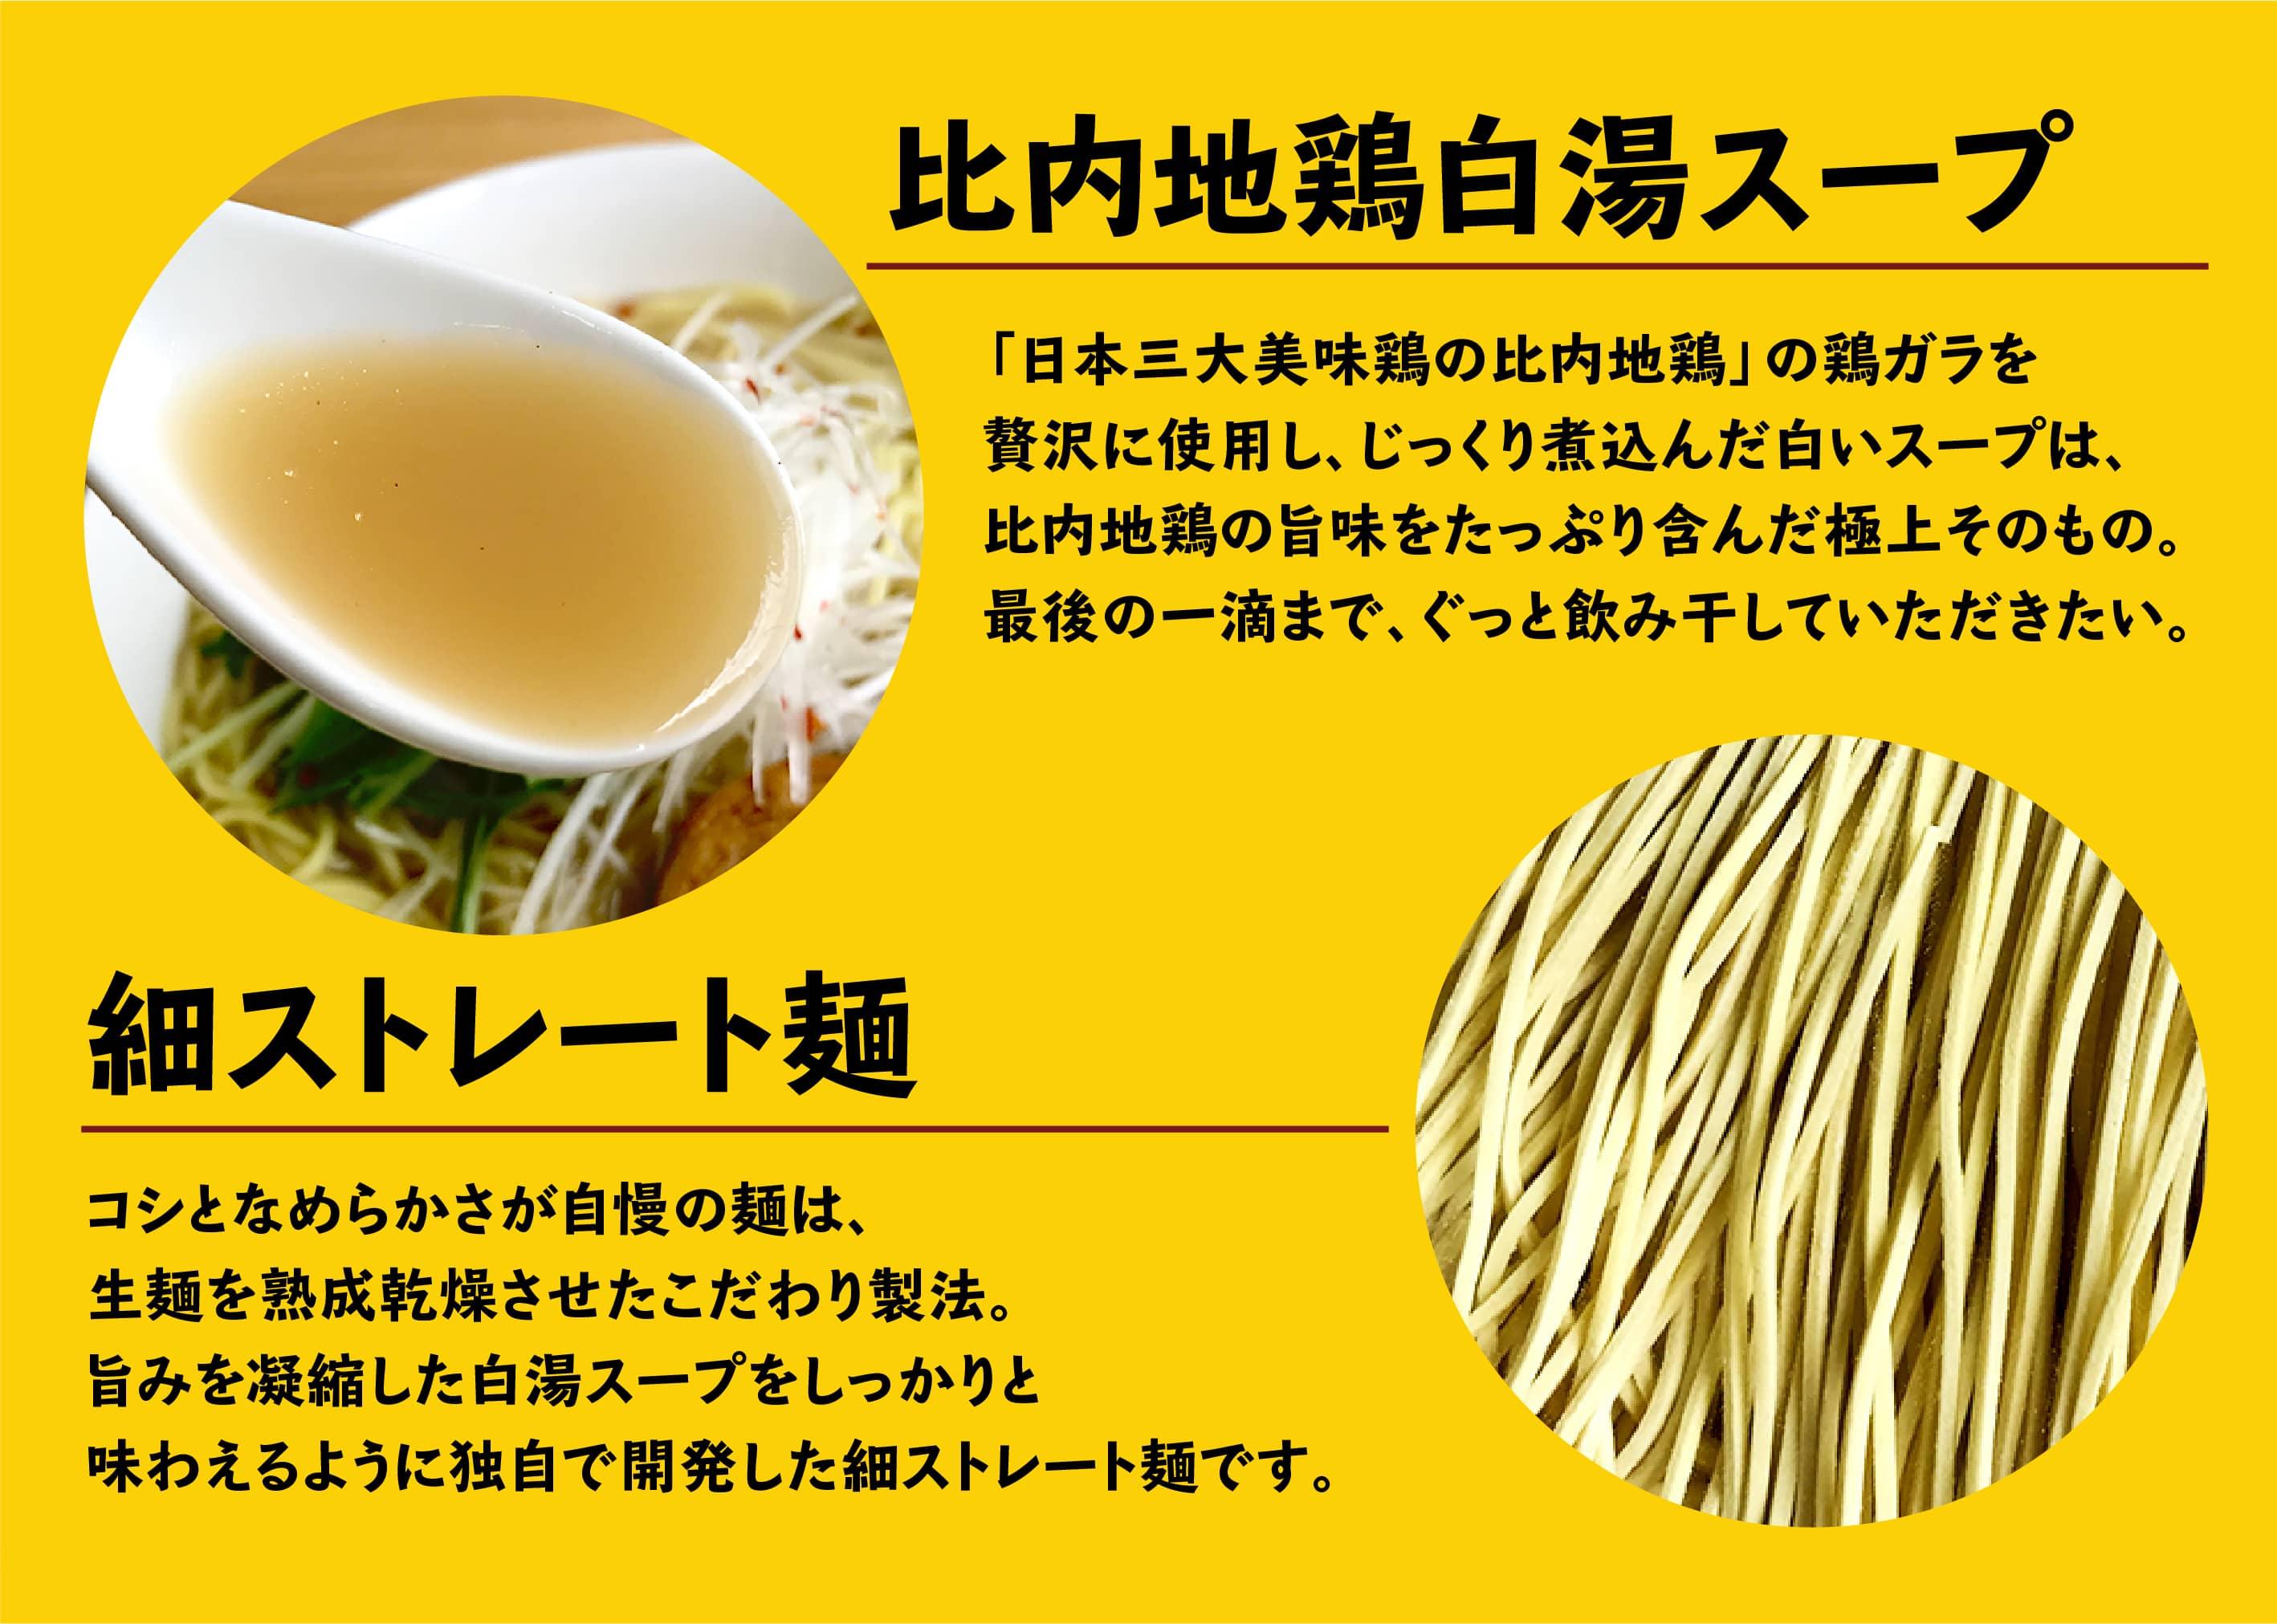 UMAMY[ウマミー] 比内地鶏白湯ラーメン 塩味